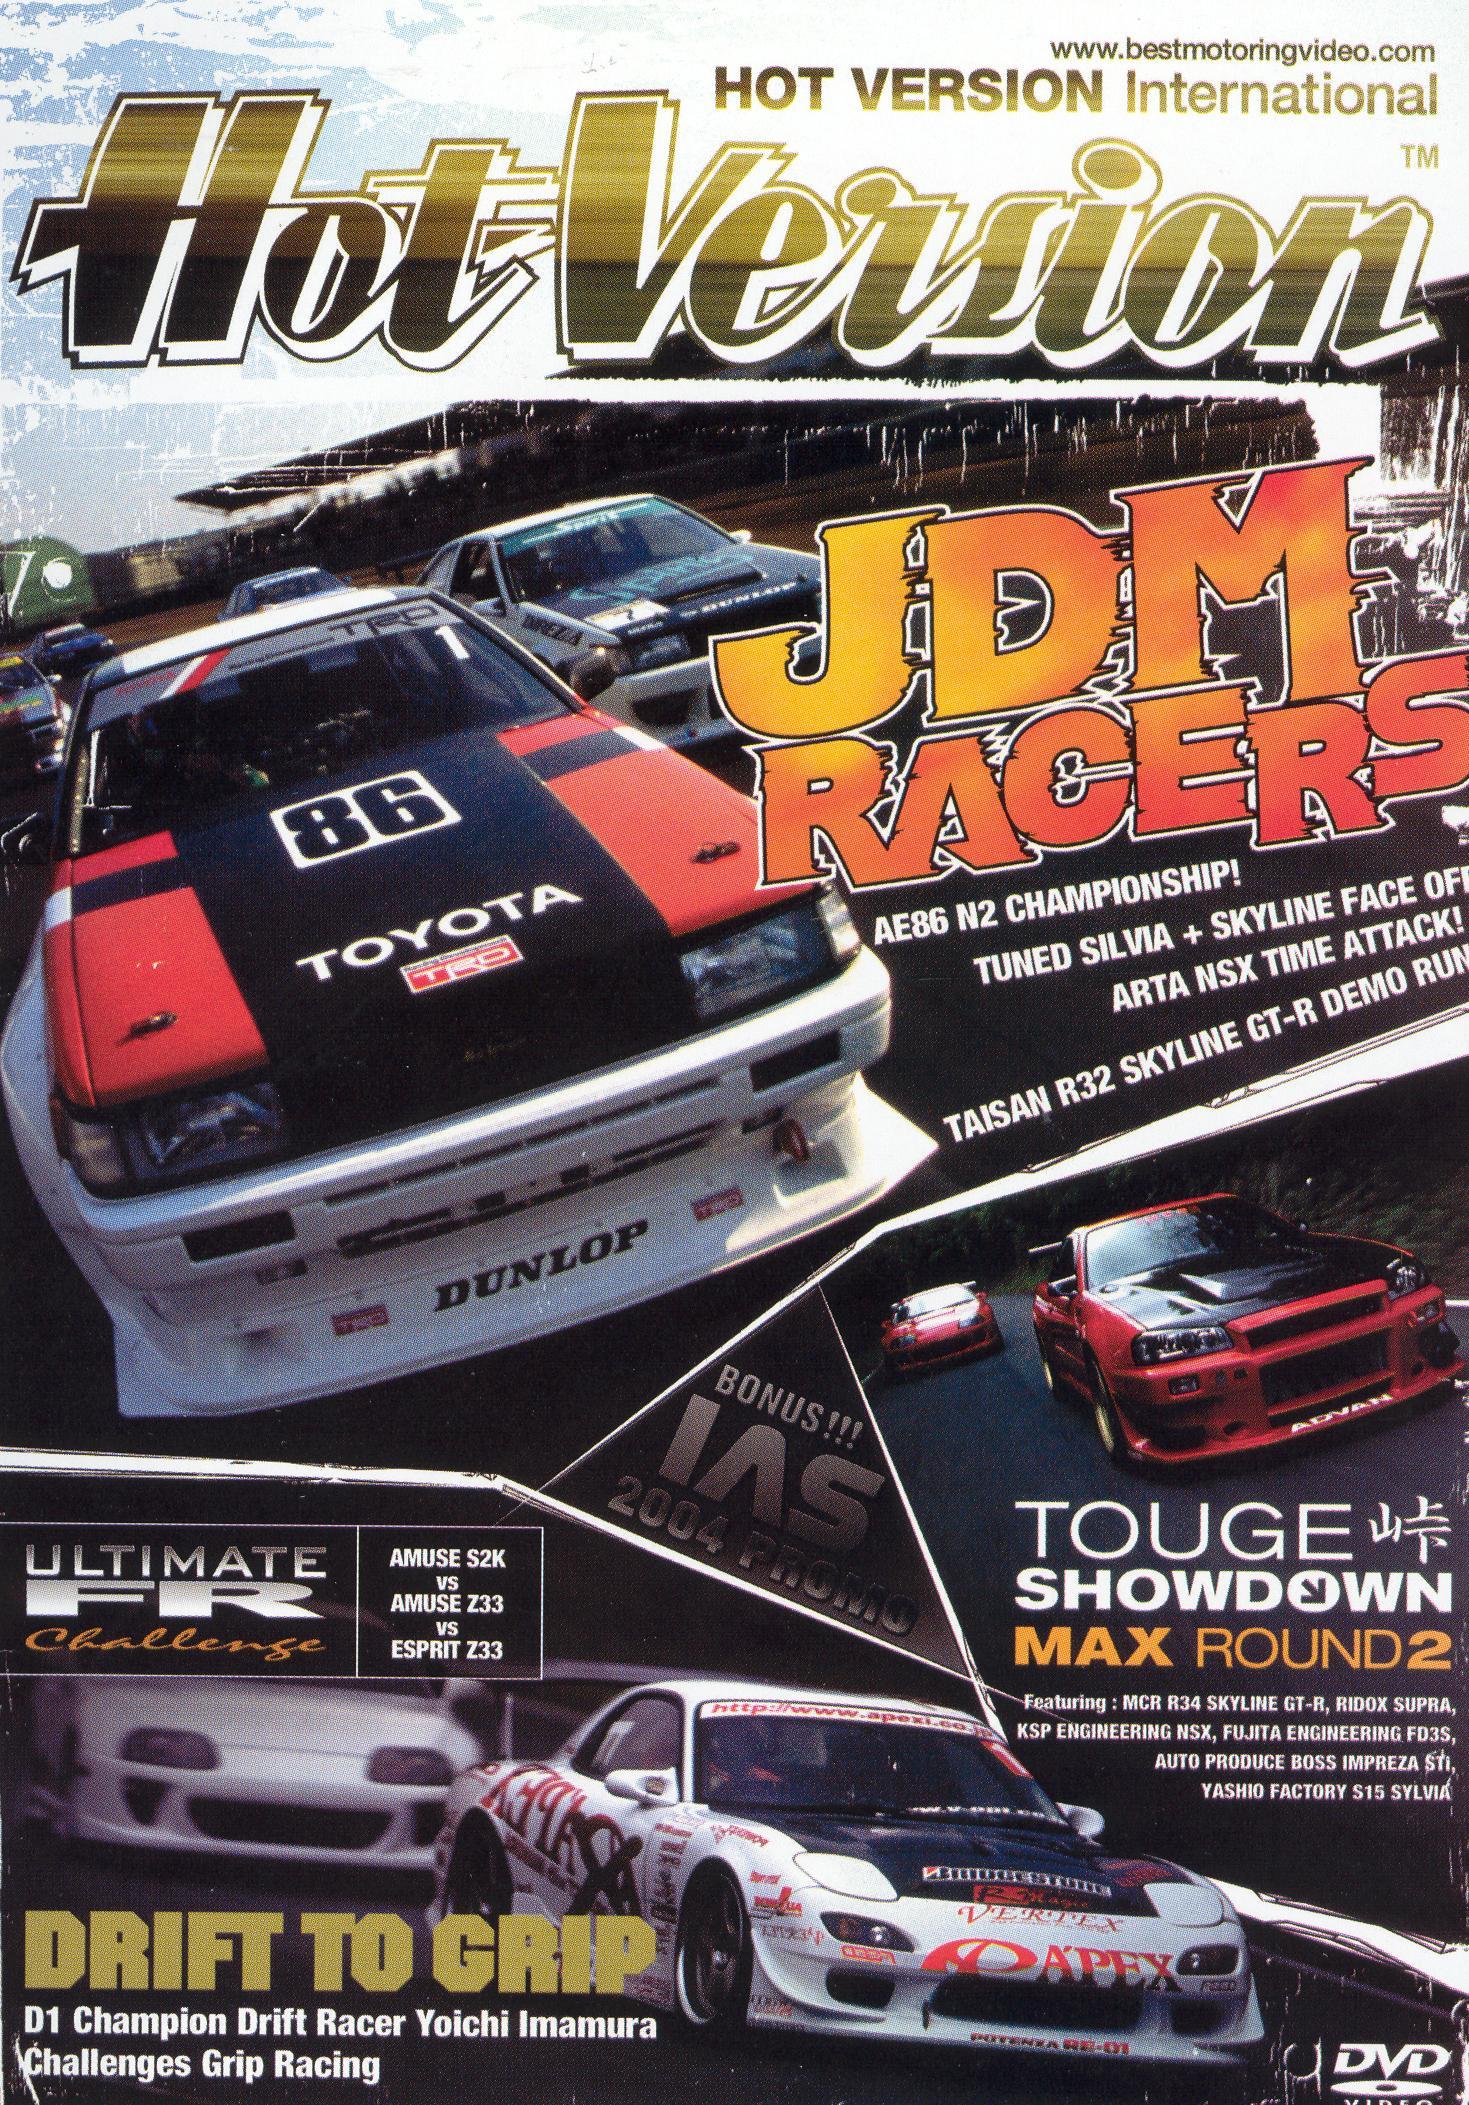 Hot Version International: JDM Racers